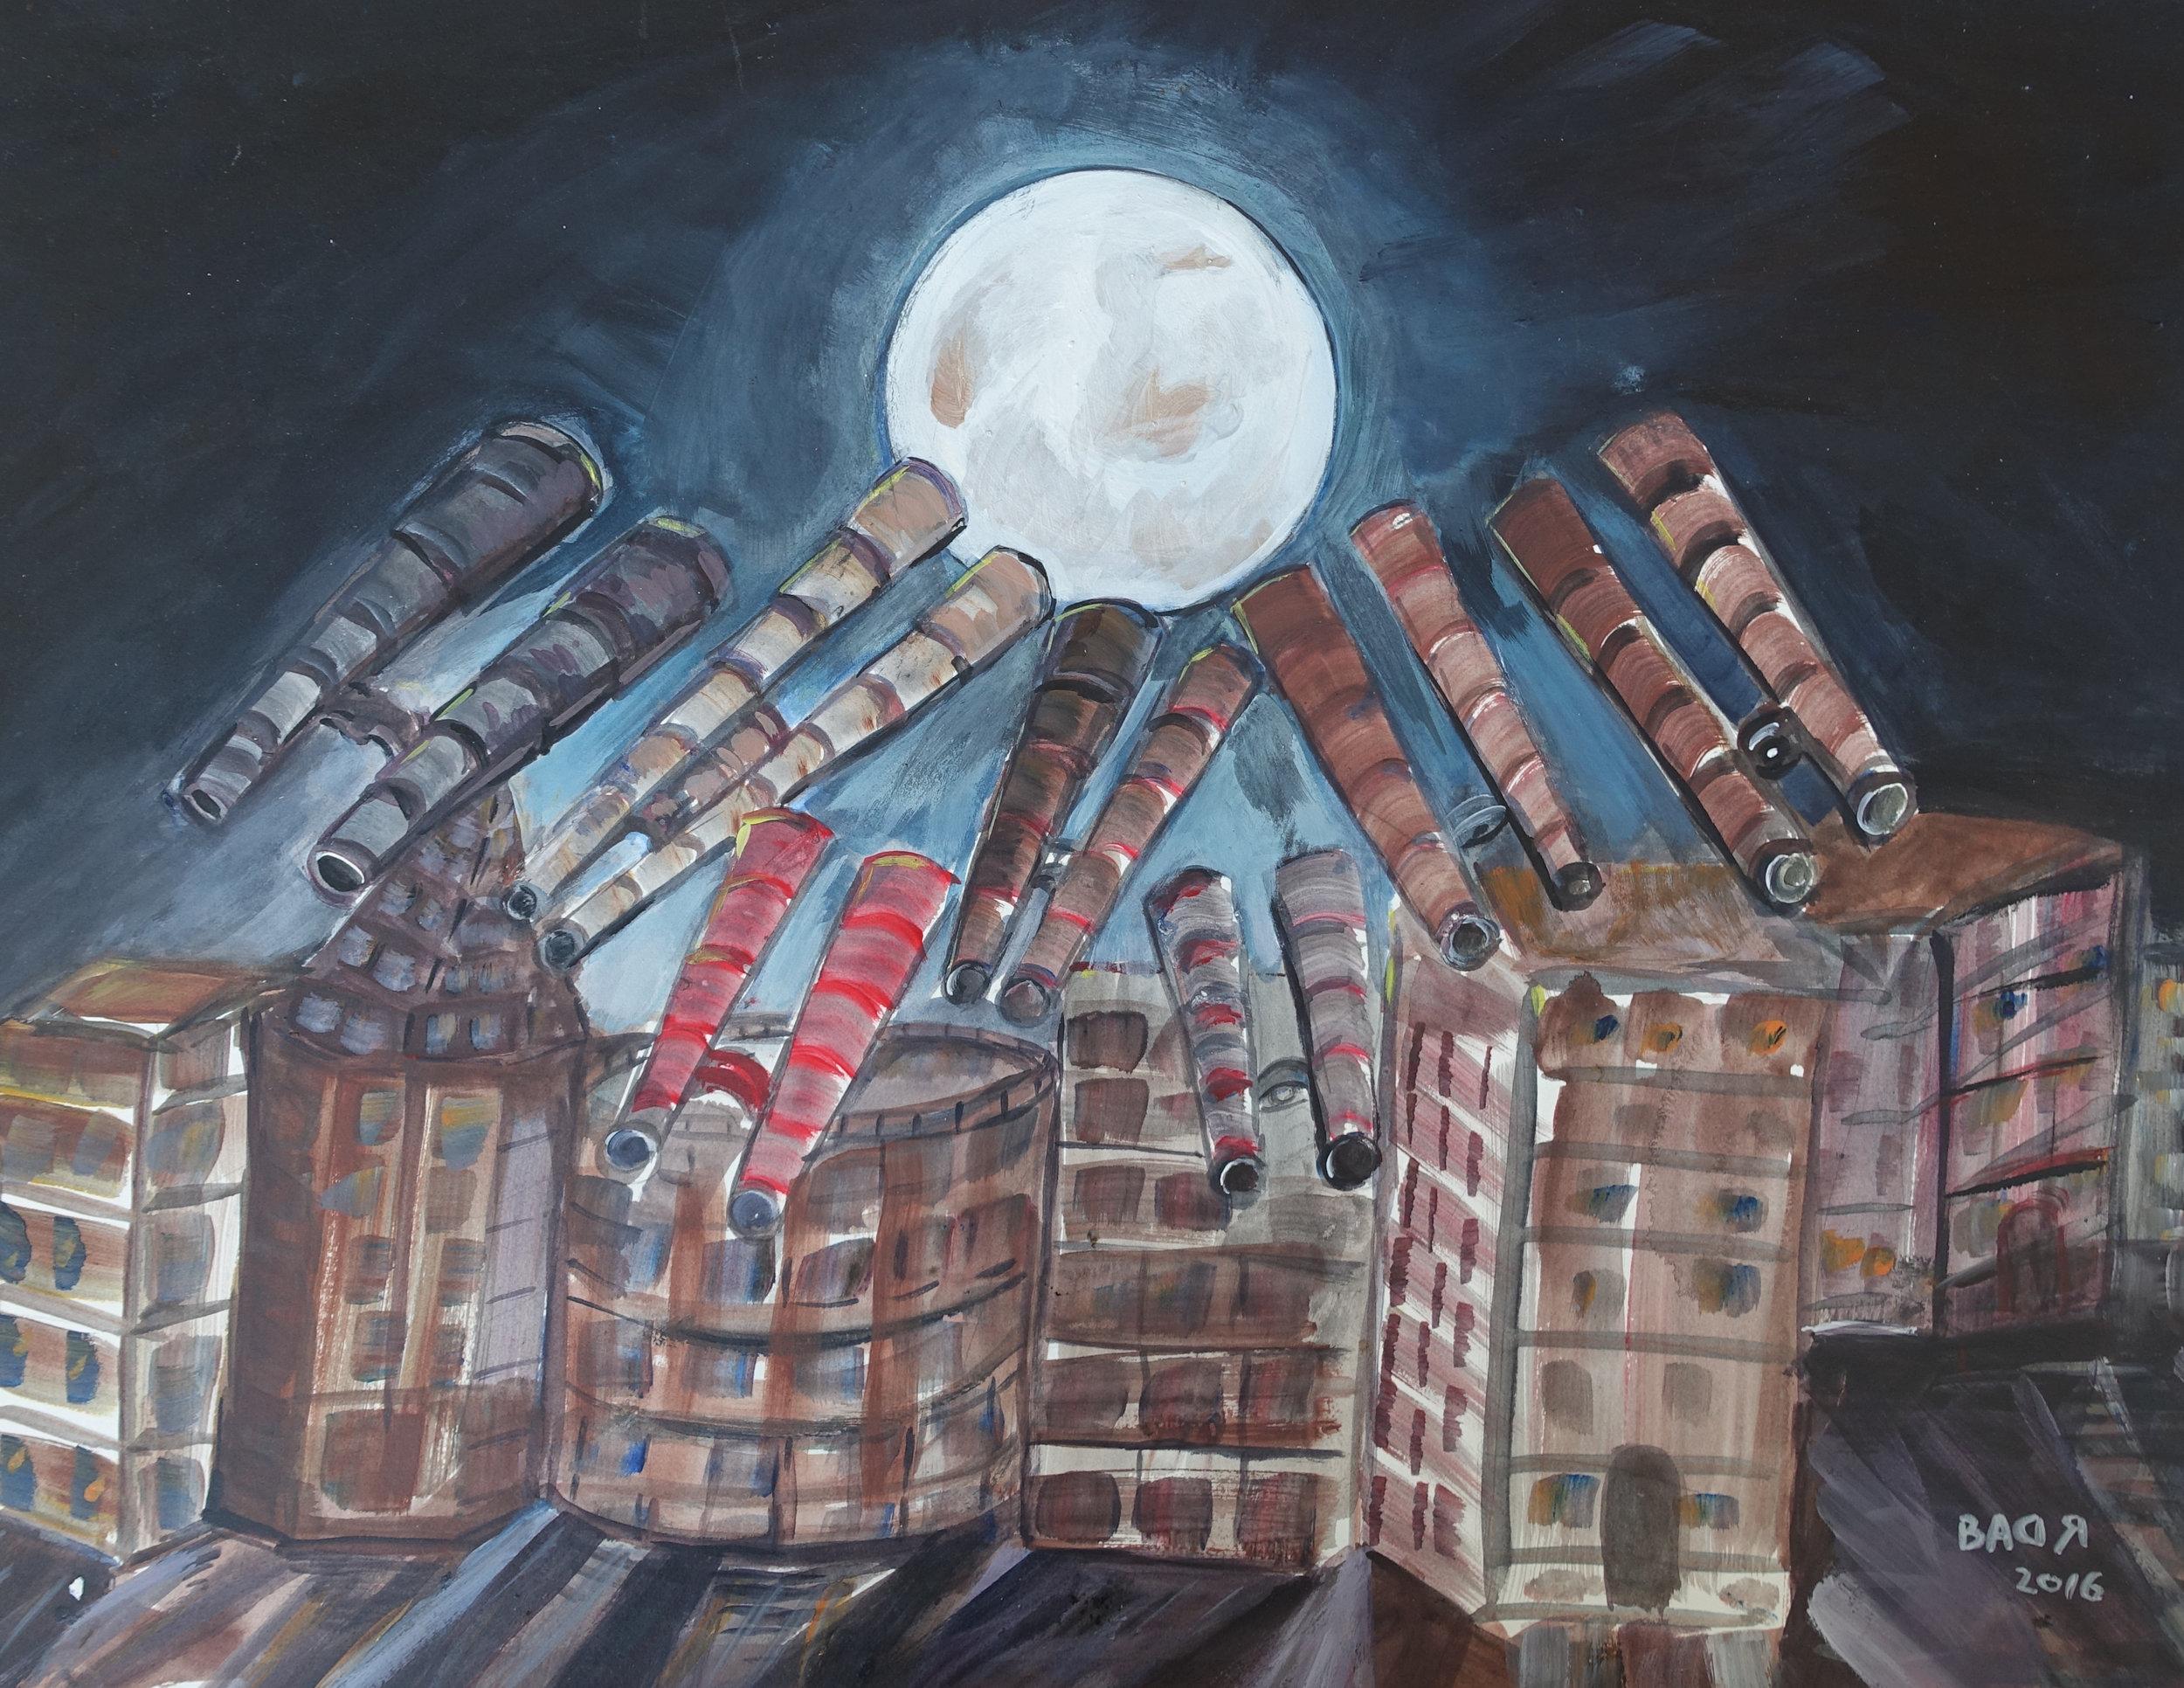 Ahmed Rabbani, Looking at the Moon, 2016.